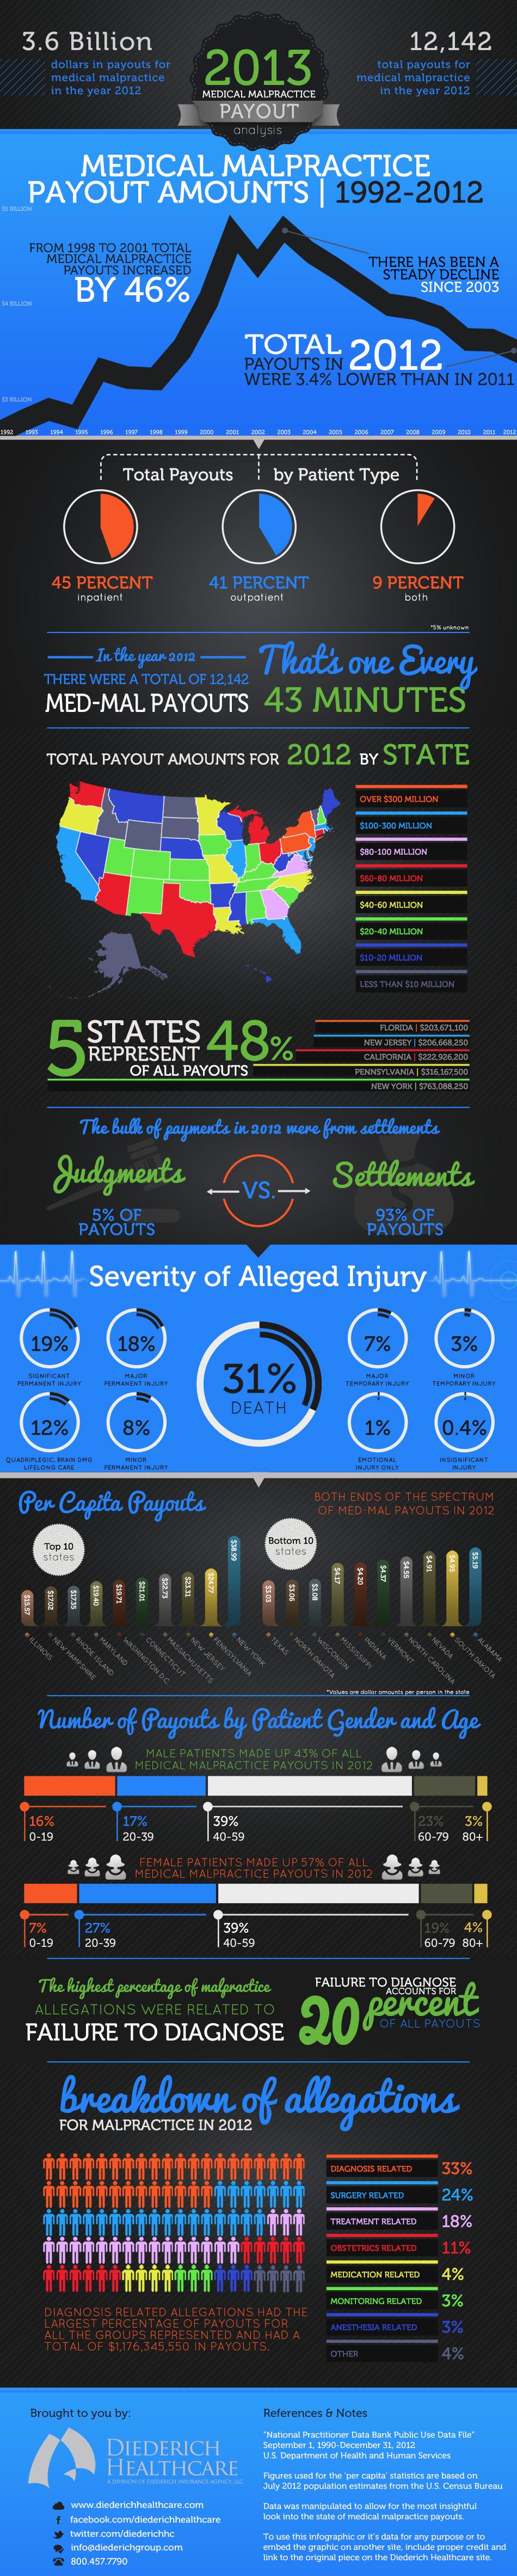 2013-medical-malpractice-payout-analysis_5182de625020c